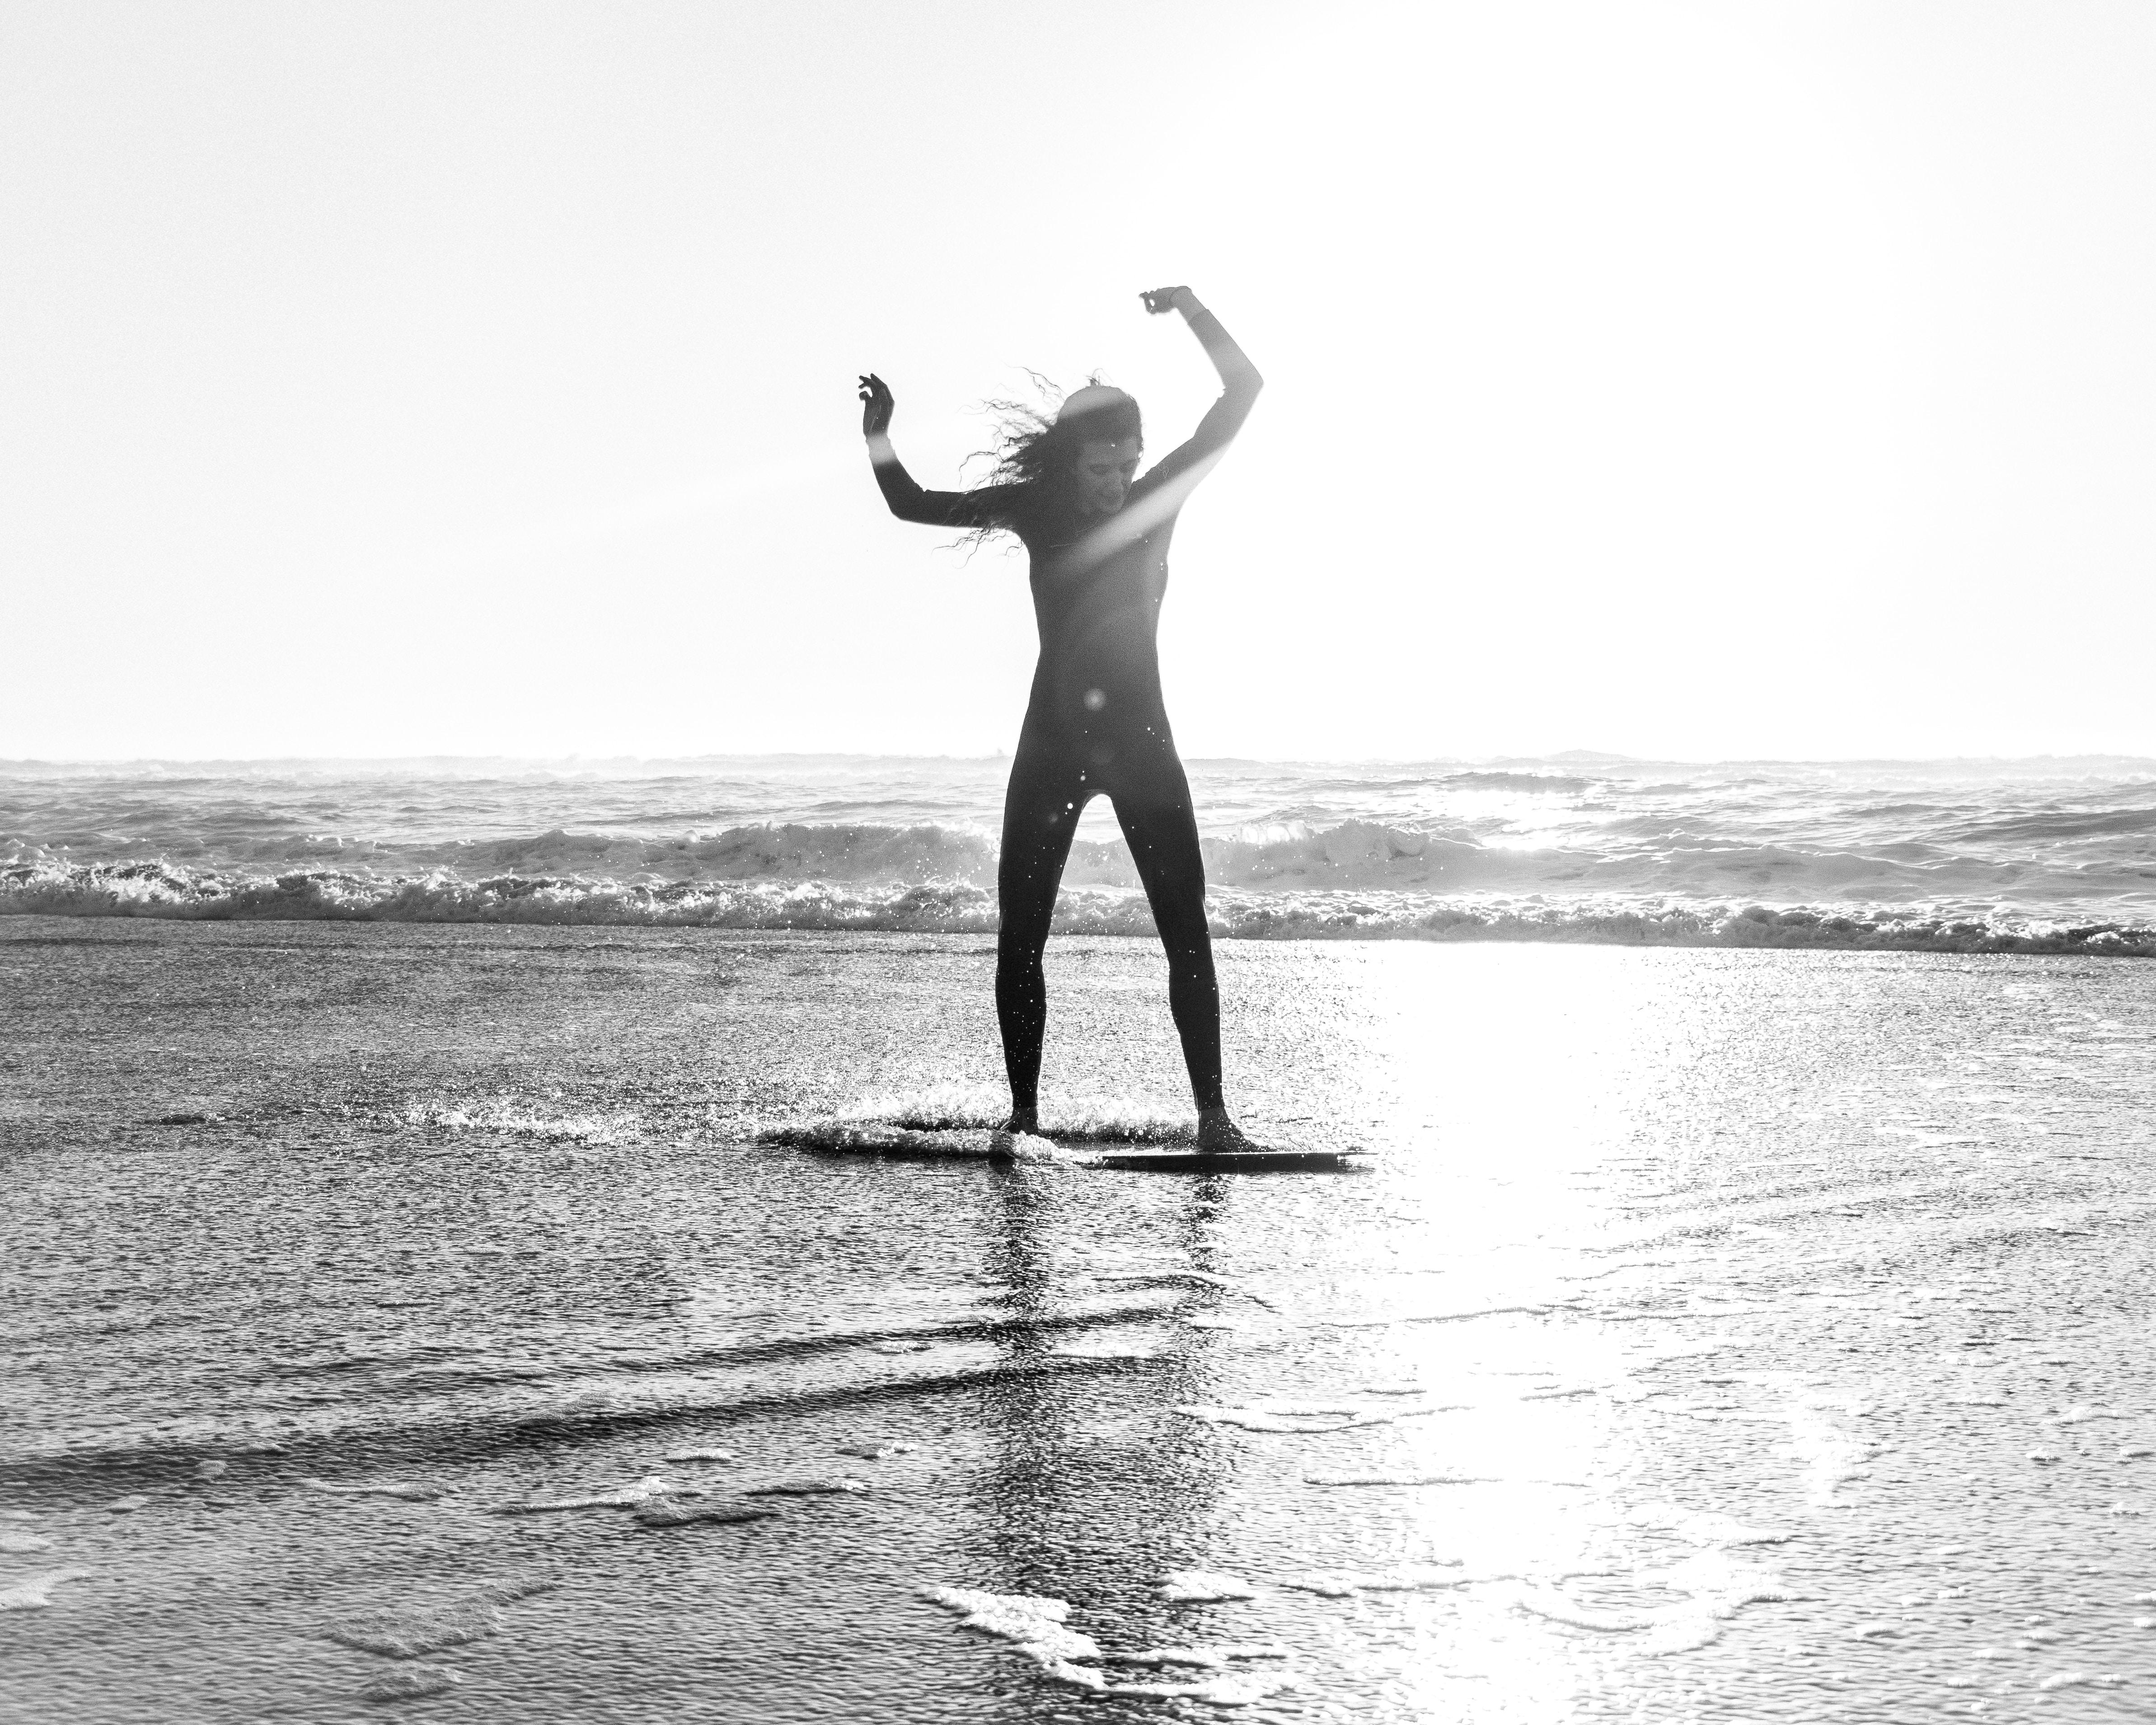 greyscale photo of woman riding skimboard